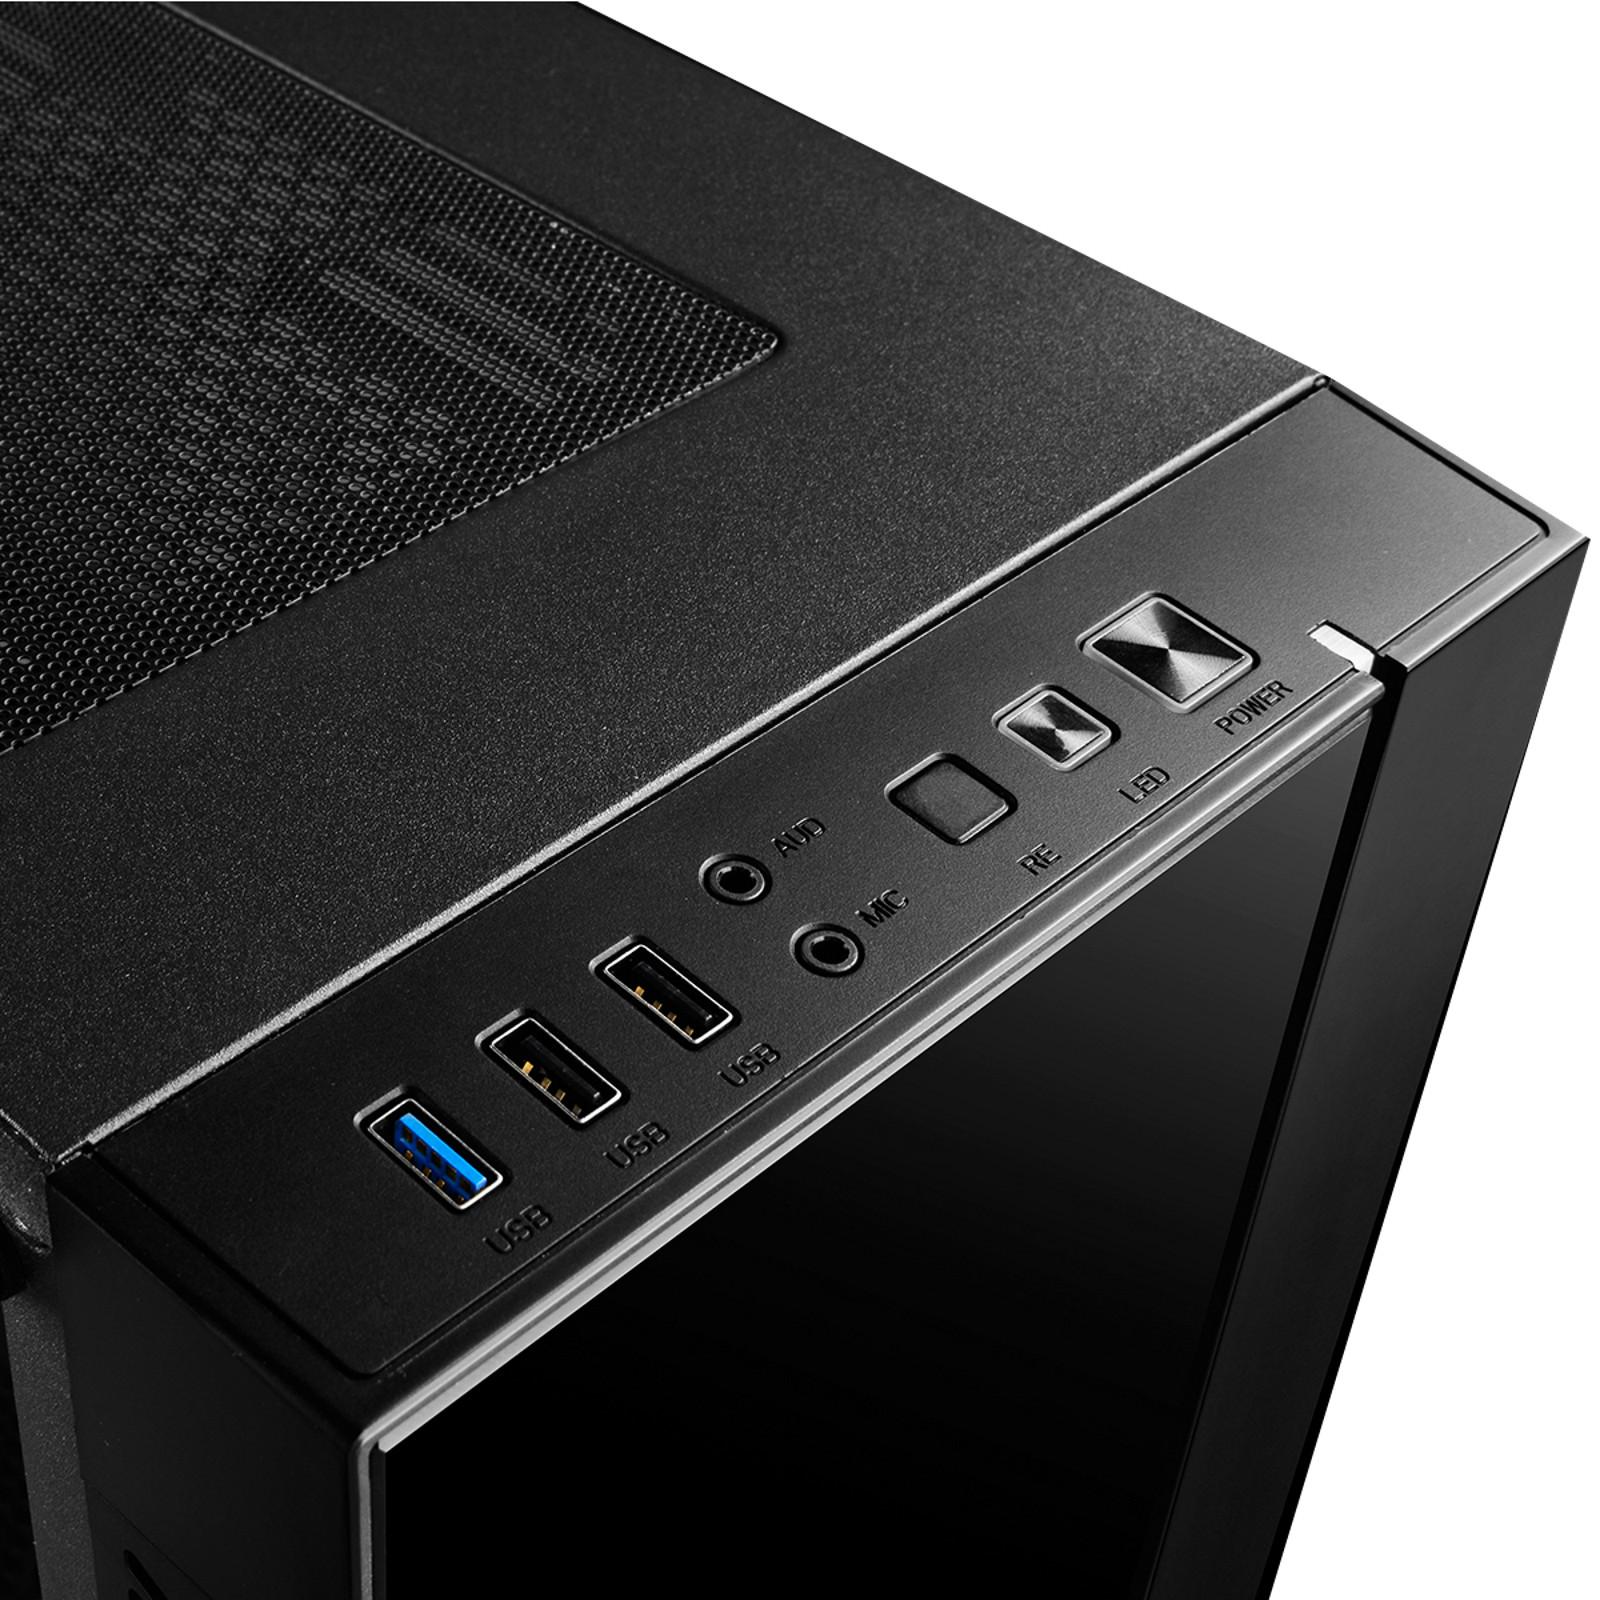 Buy the GGPC Legend RTX 2070 Gaming PC AMD Ryzen 7 2700 8